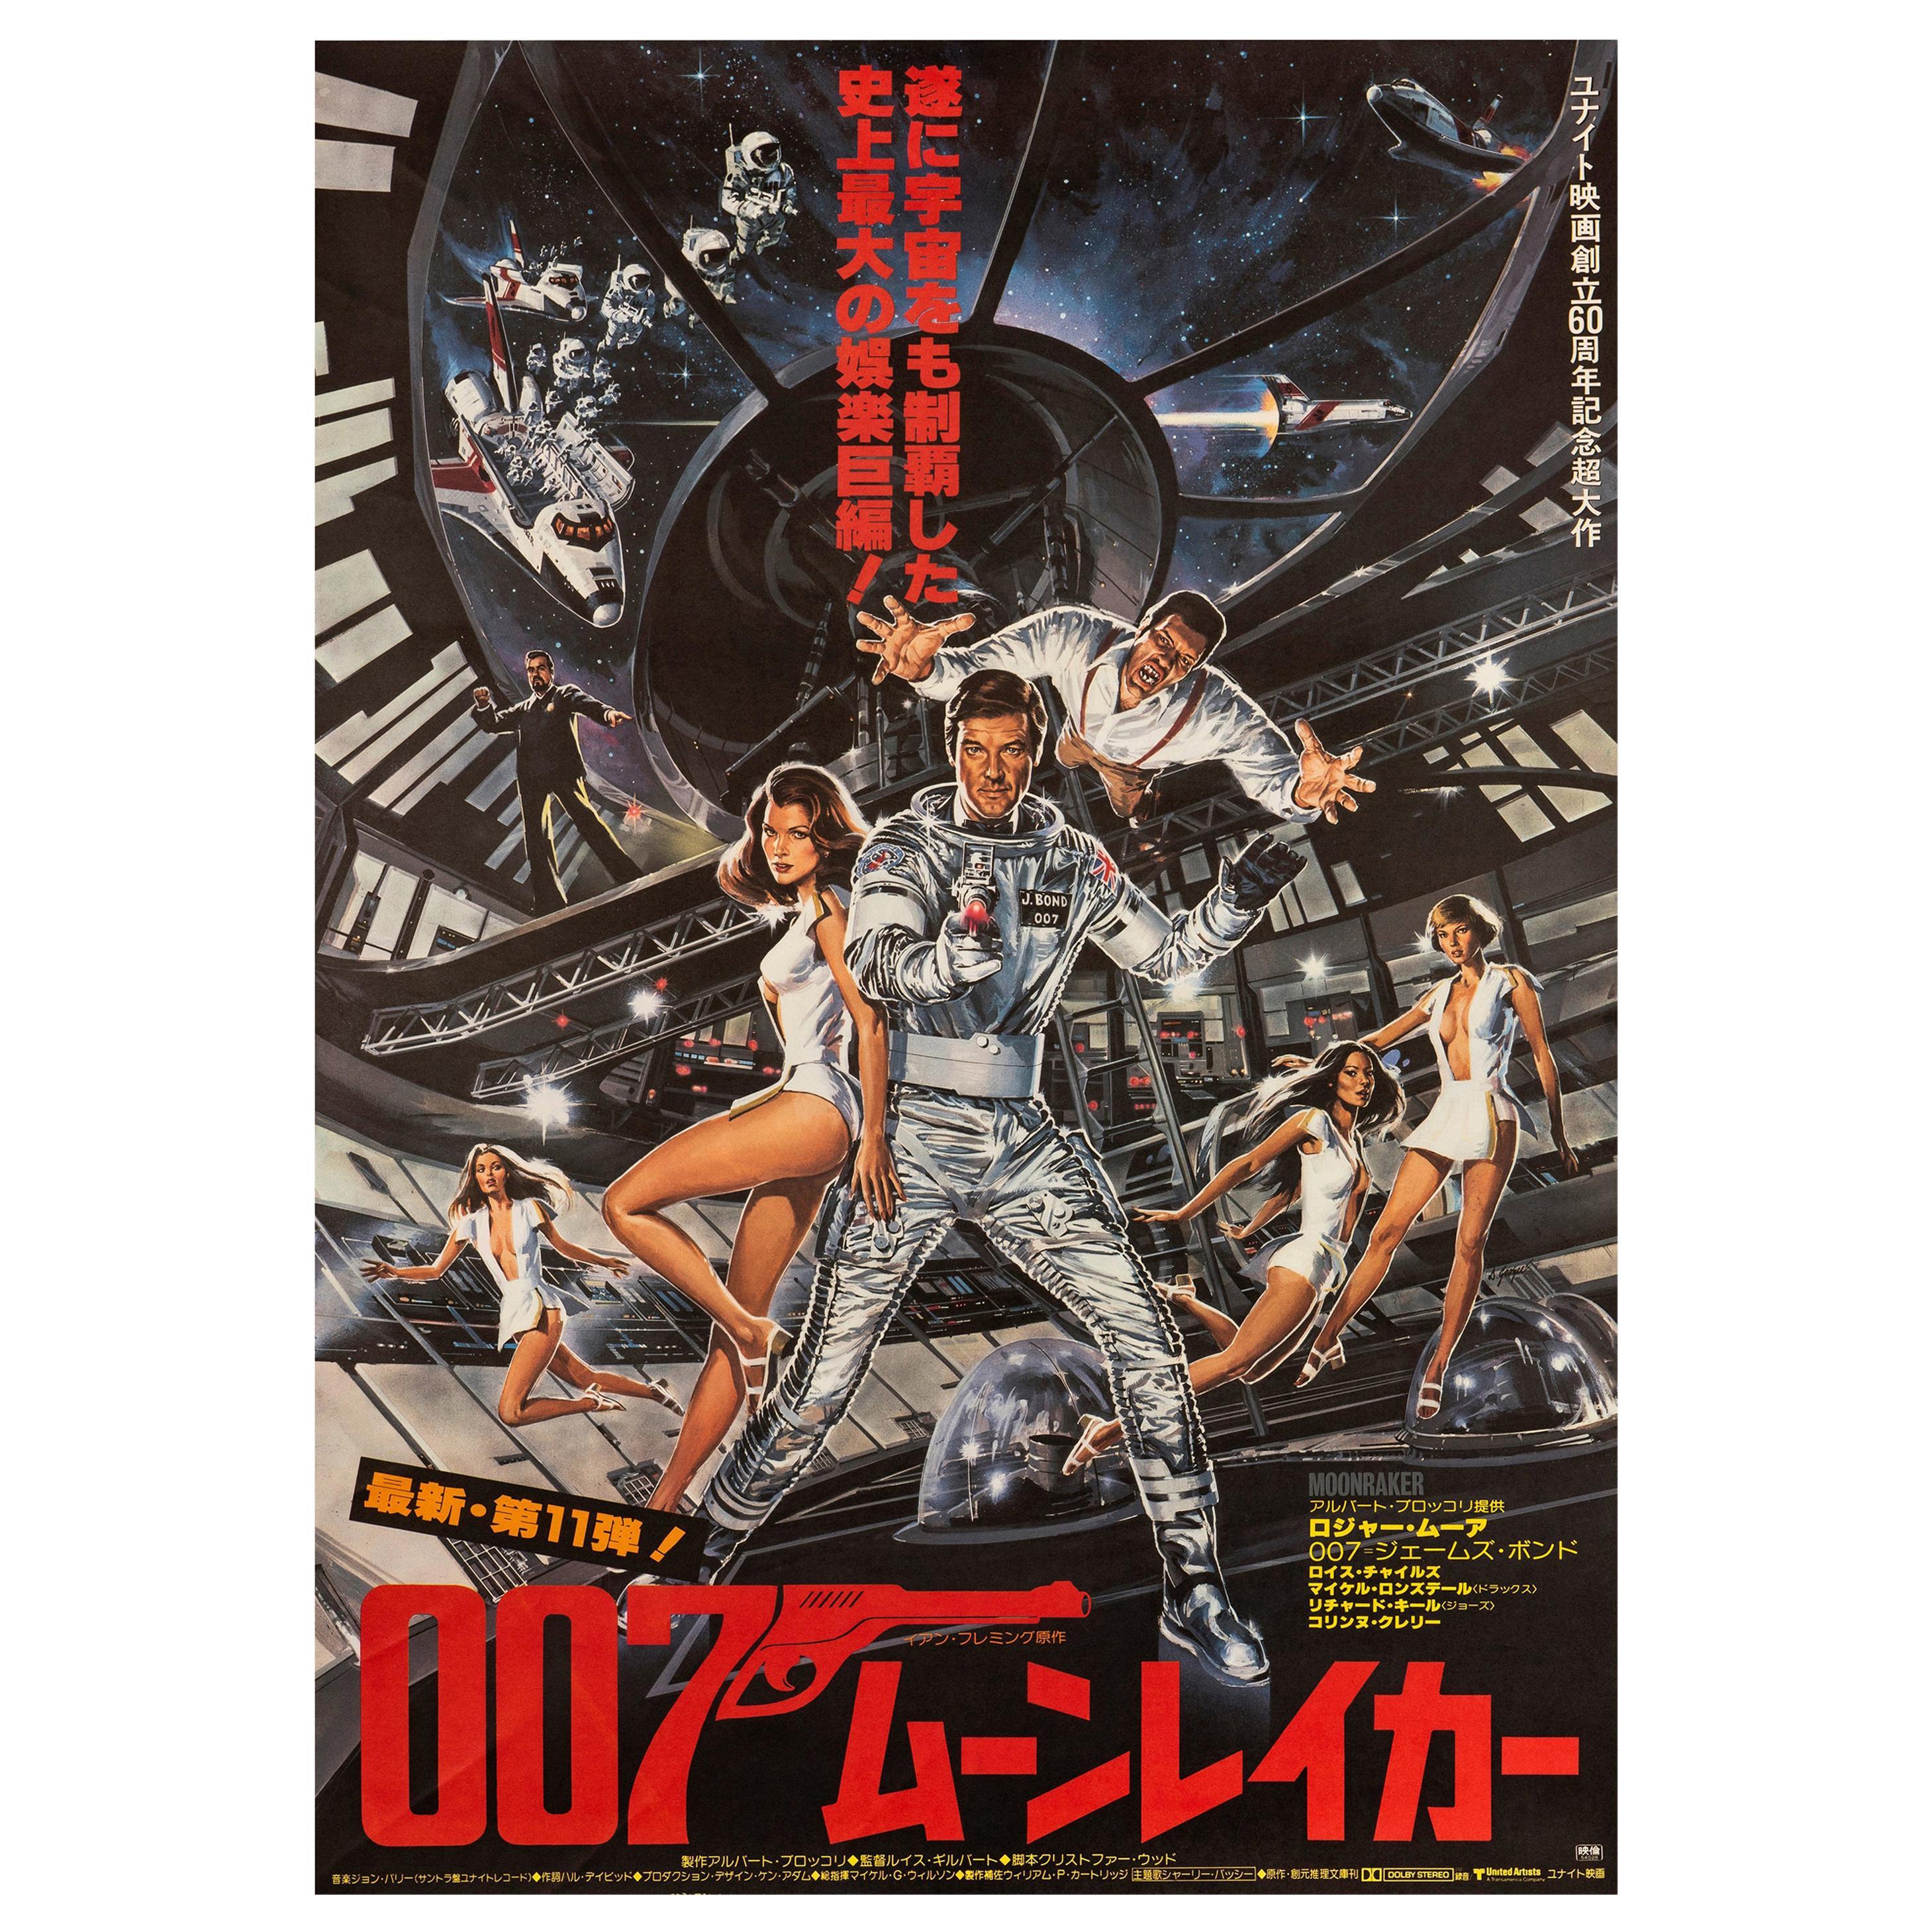 James Bond 'Moonraker' Original Vintage Movie Poster, Japanese, 1979